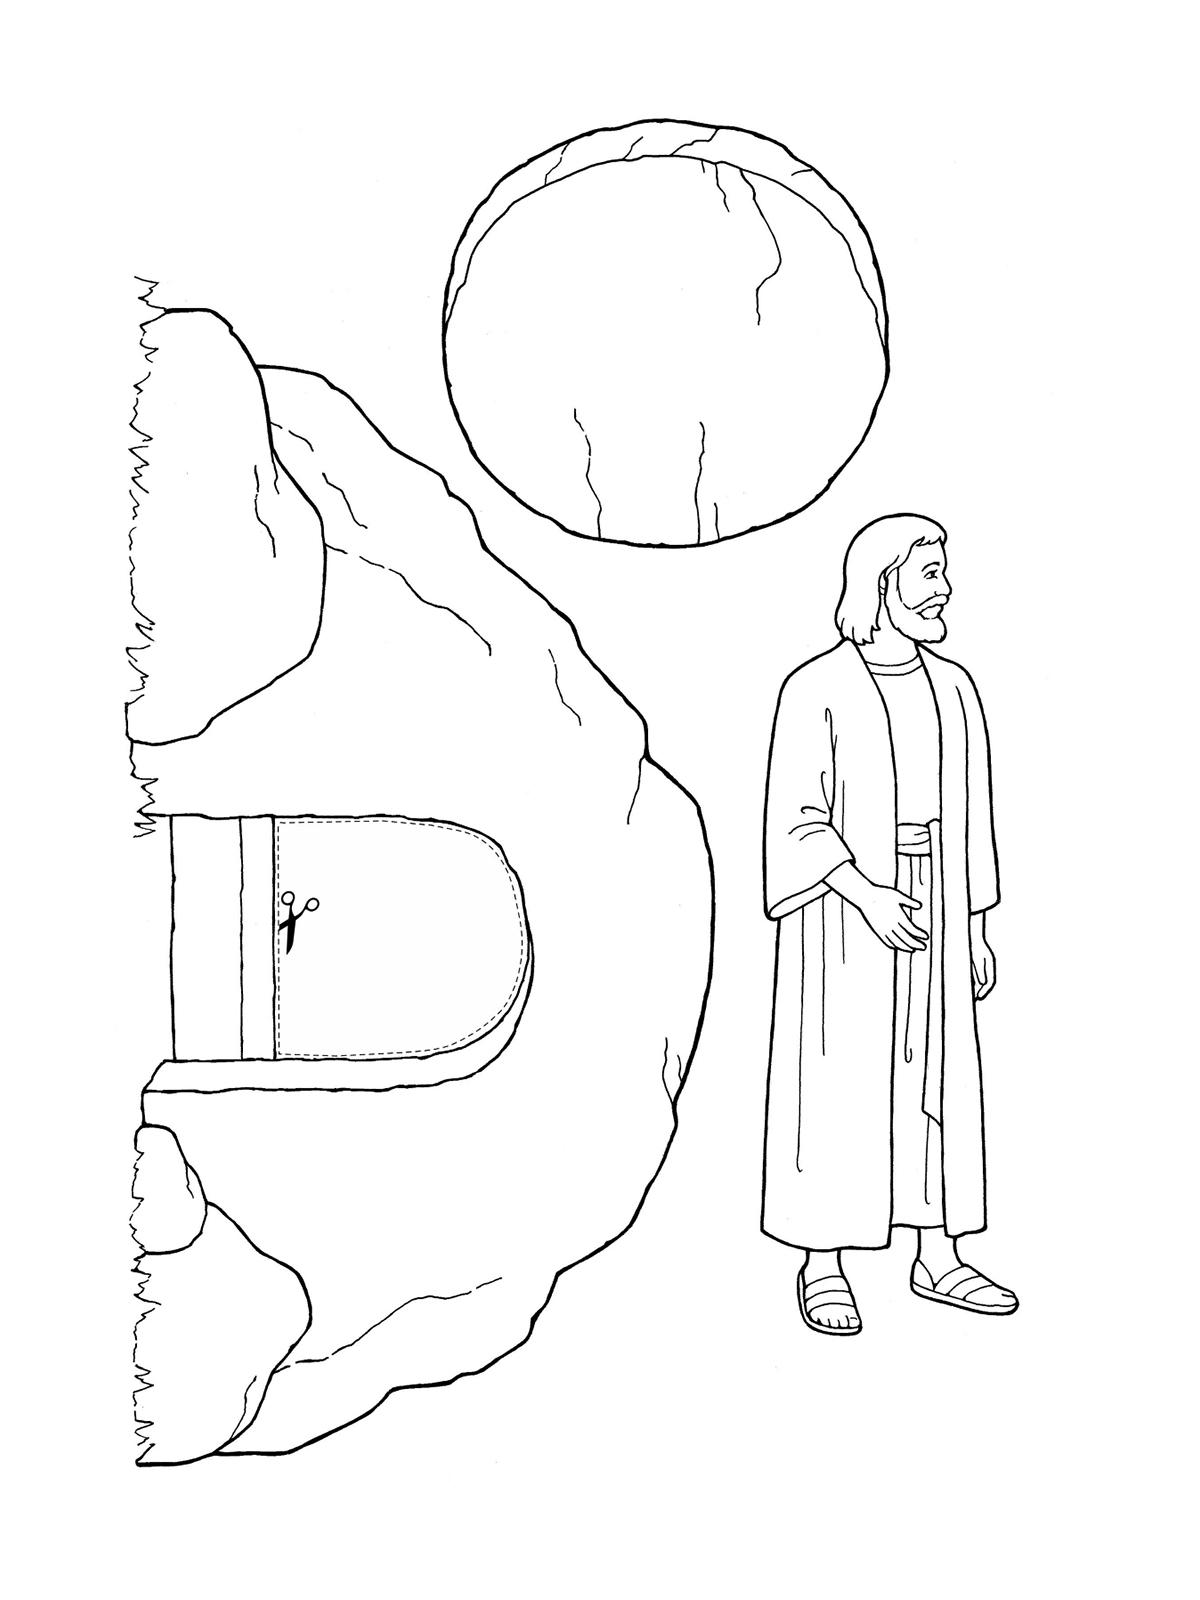 Nursery Manual Page 123: Jesus Christ Was Resurrected